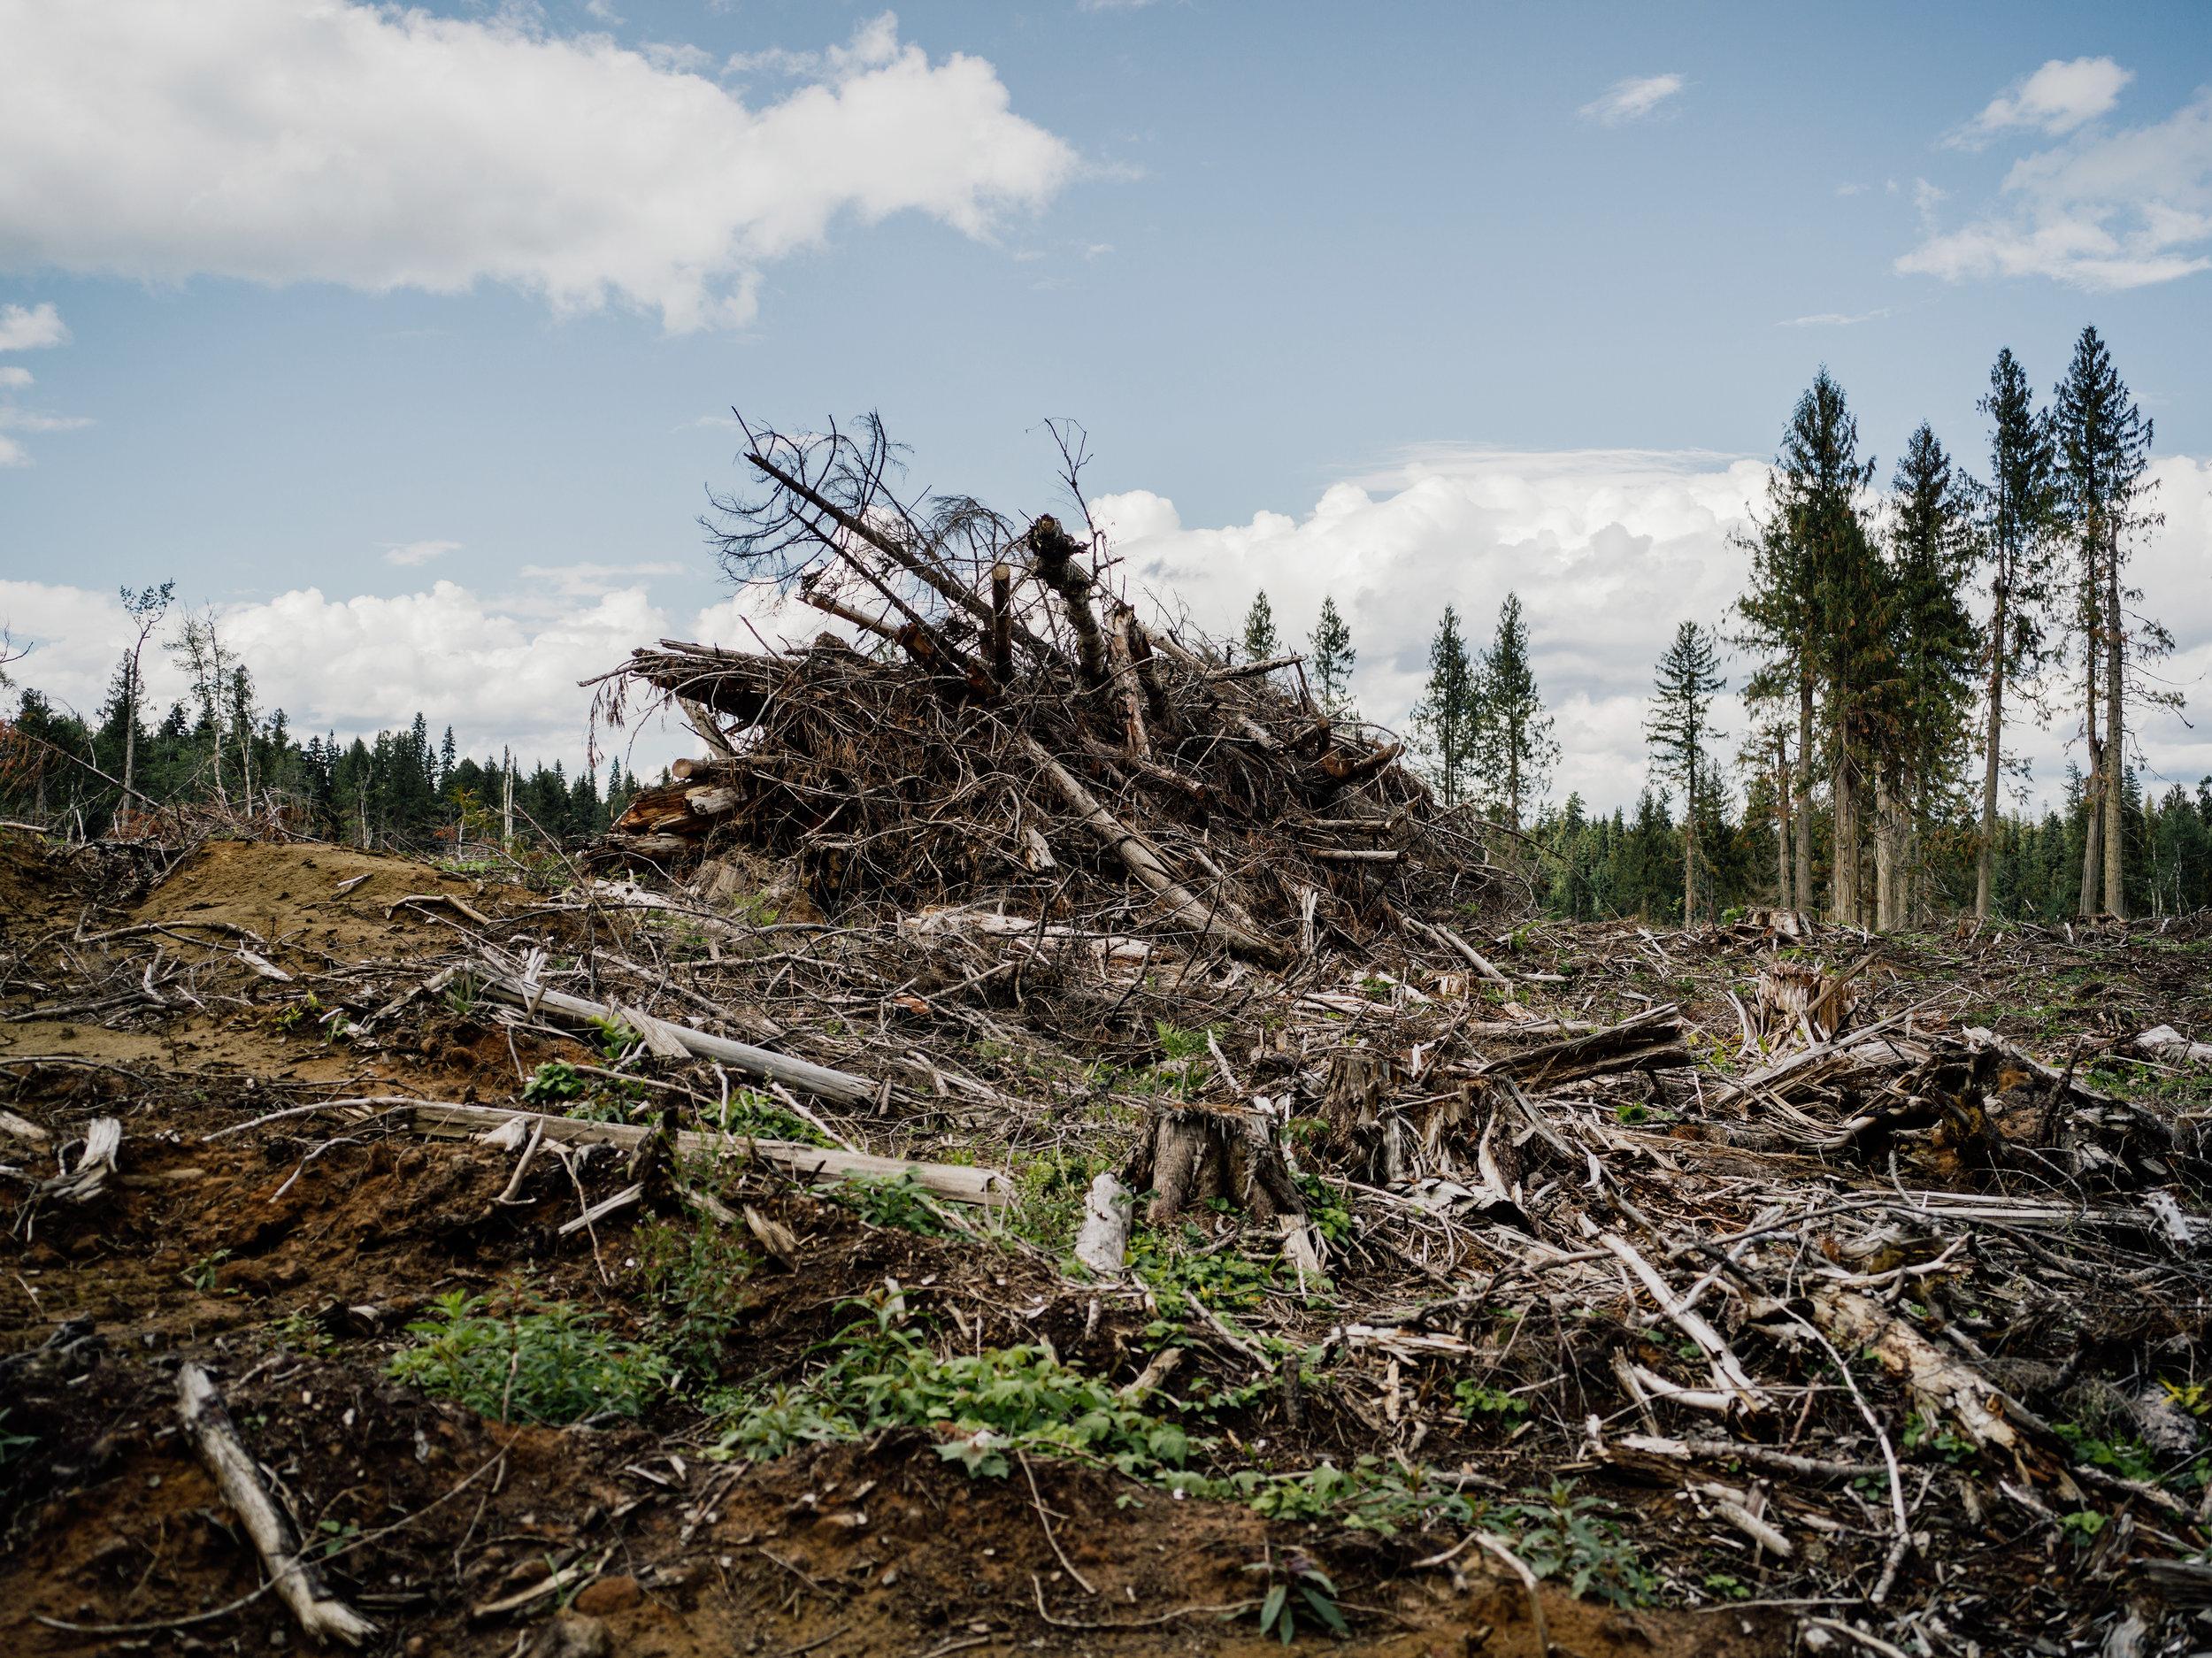 Inland-Temperate-Rainforest-TheNarwhal-0121.JPG